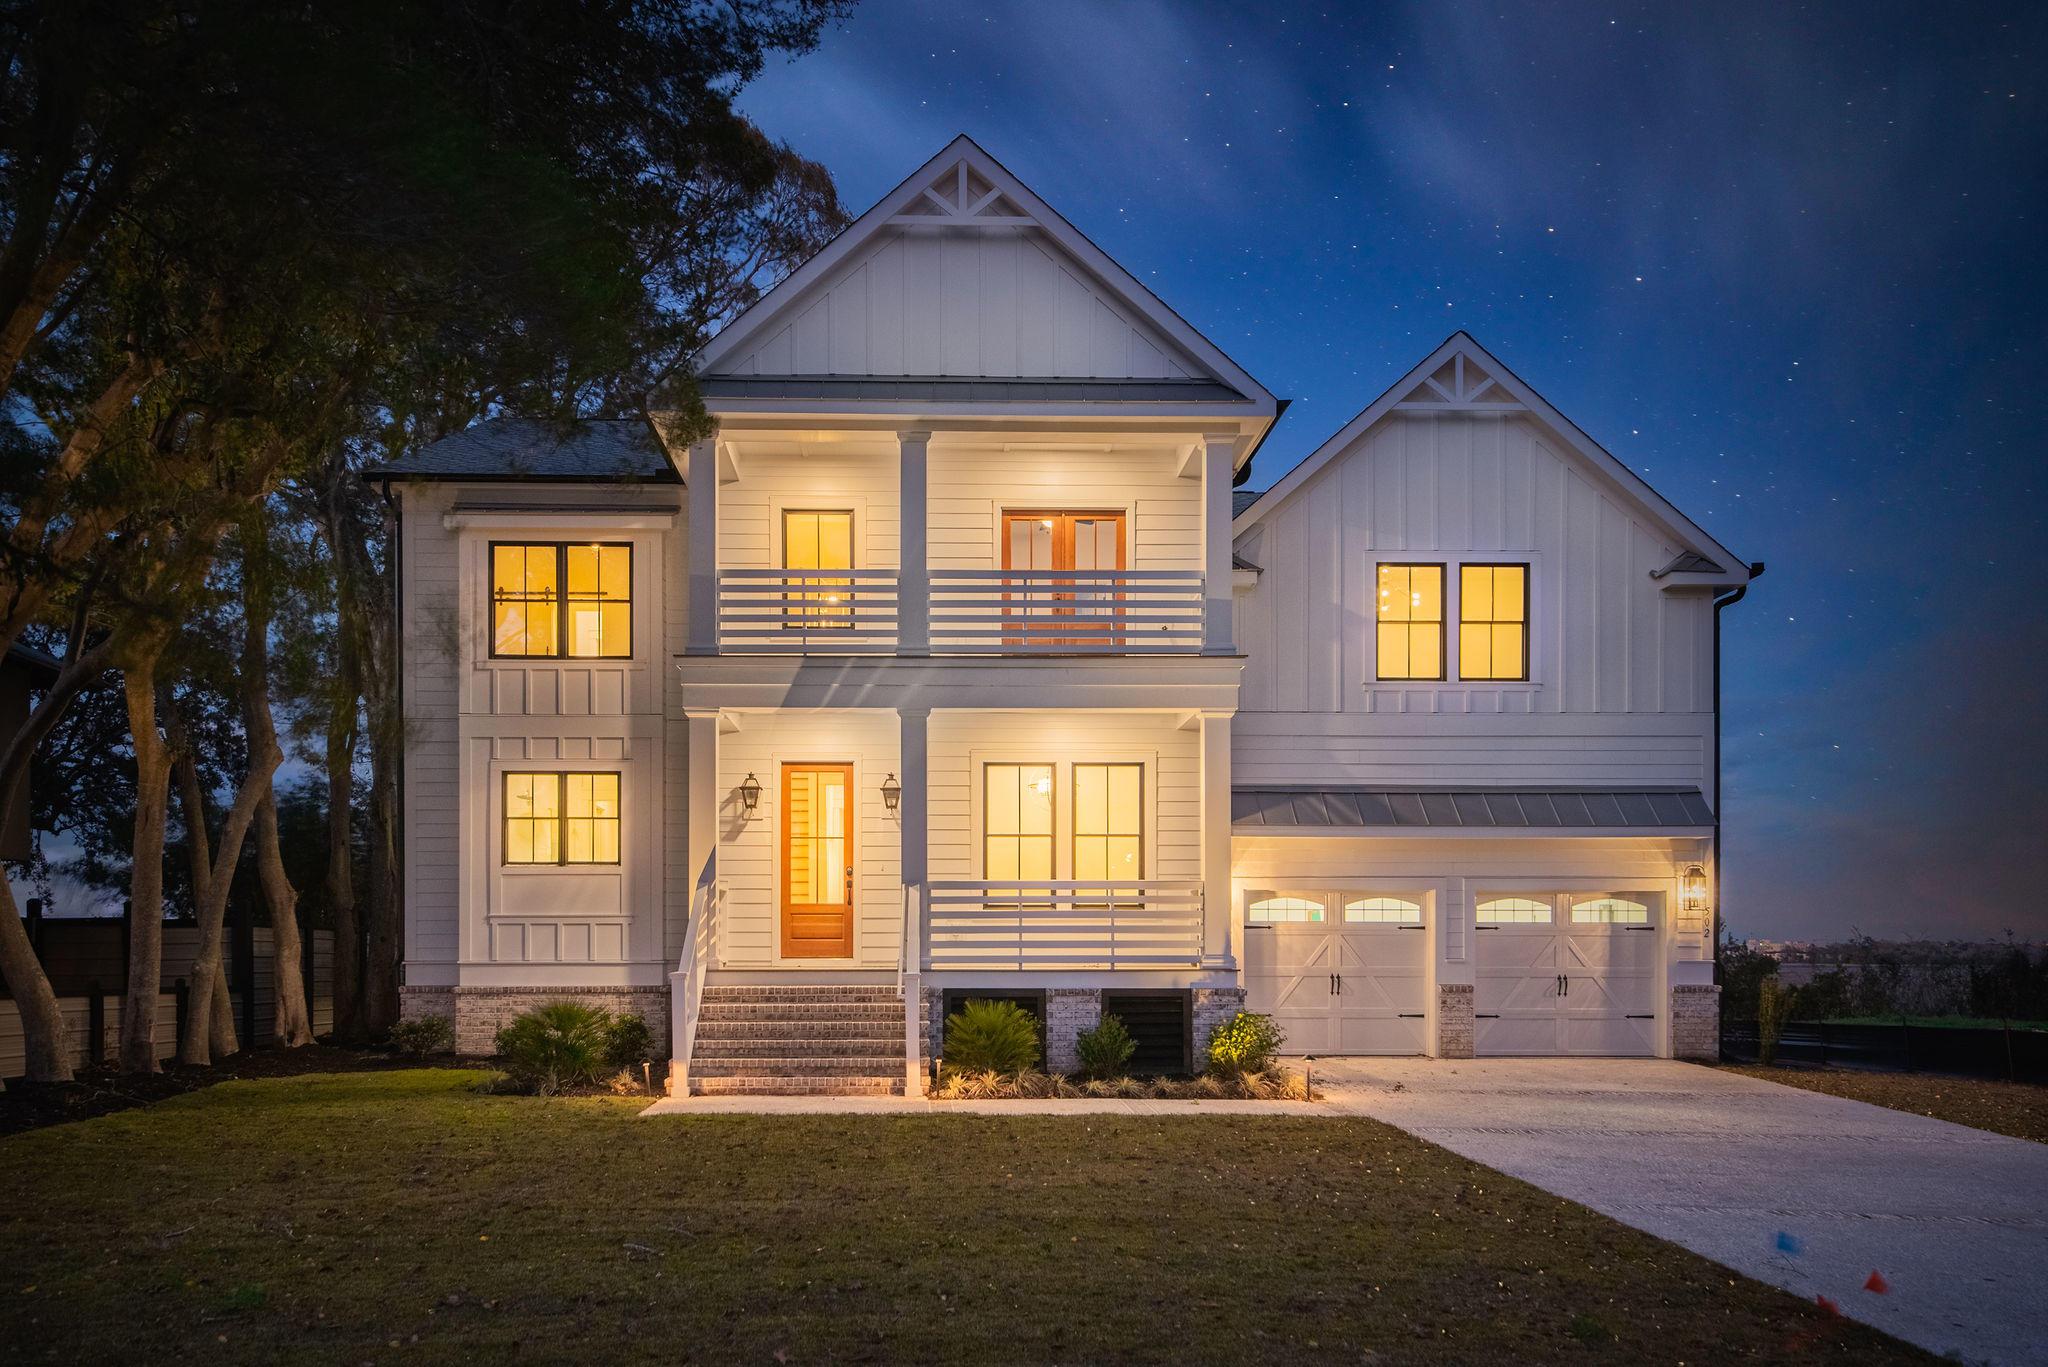 Park West Homes For Sale - 2292 Middlesex, Mount Pleasant, SC - 23